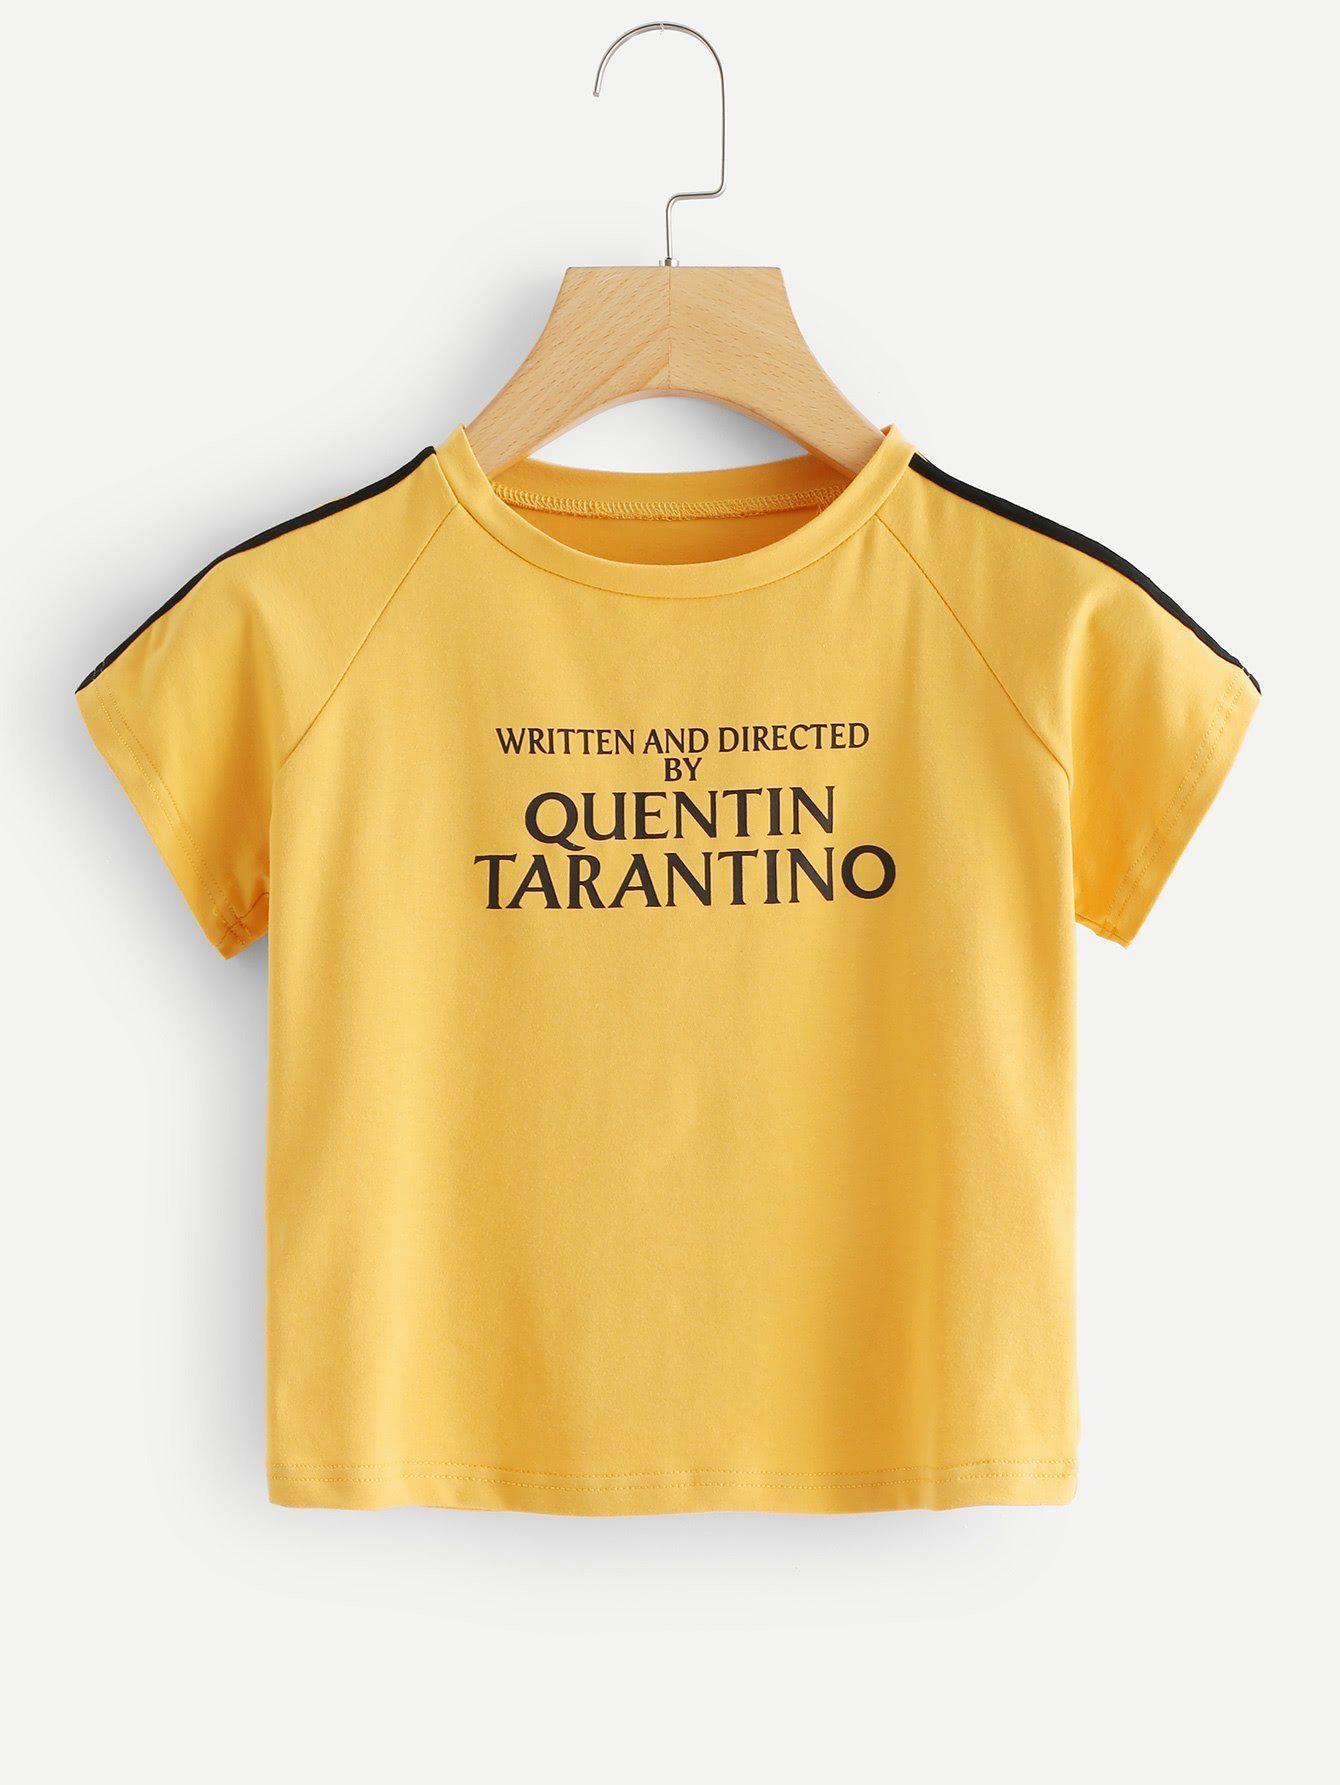 08b98b0cfb8eb Written and directed by Quentin Tarantino crop top shirt. Crop Top Shirts